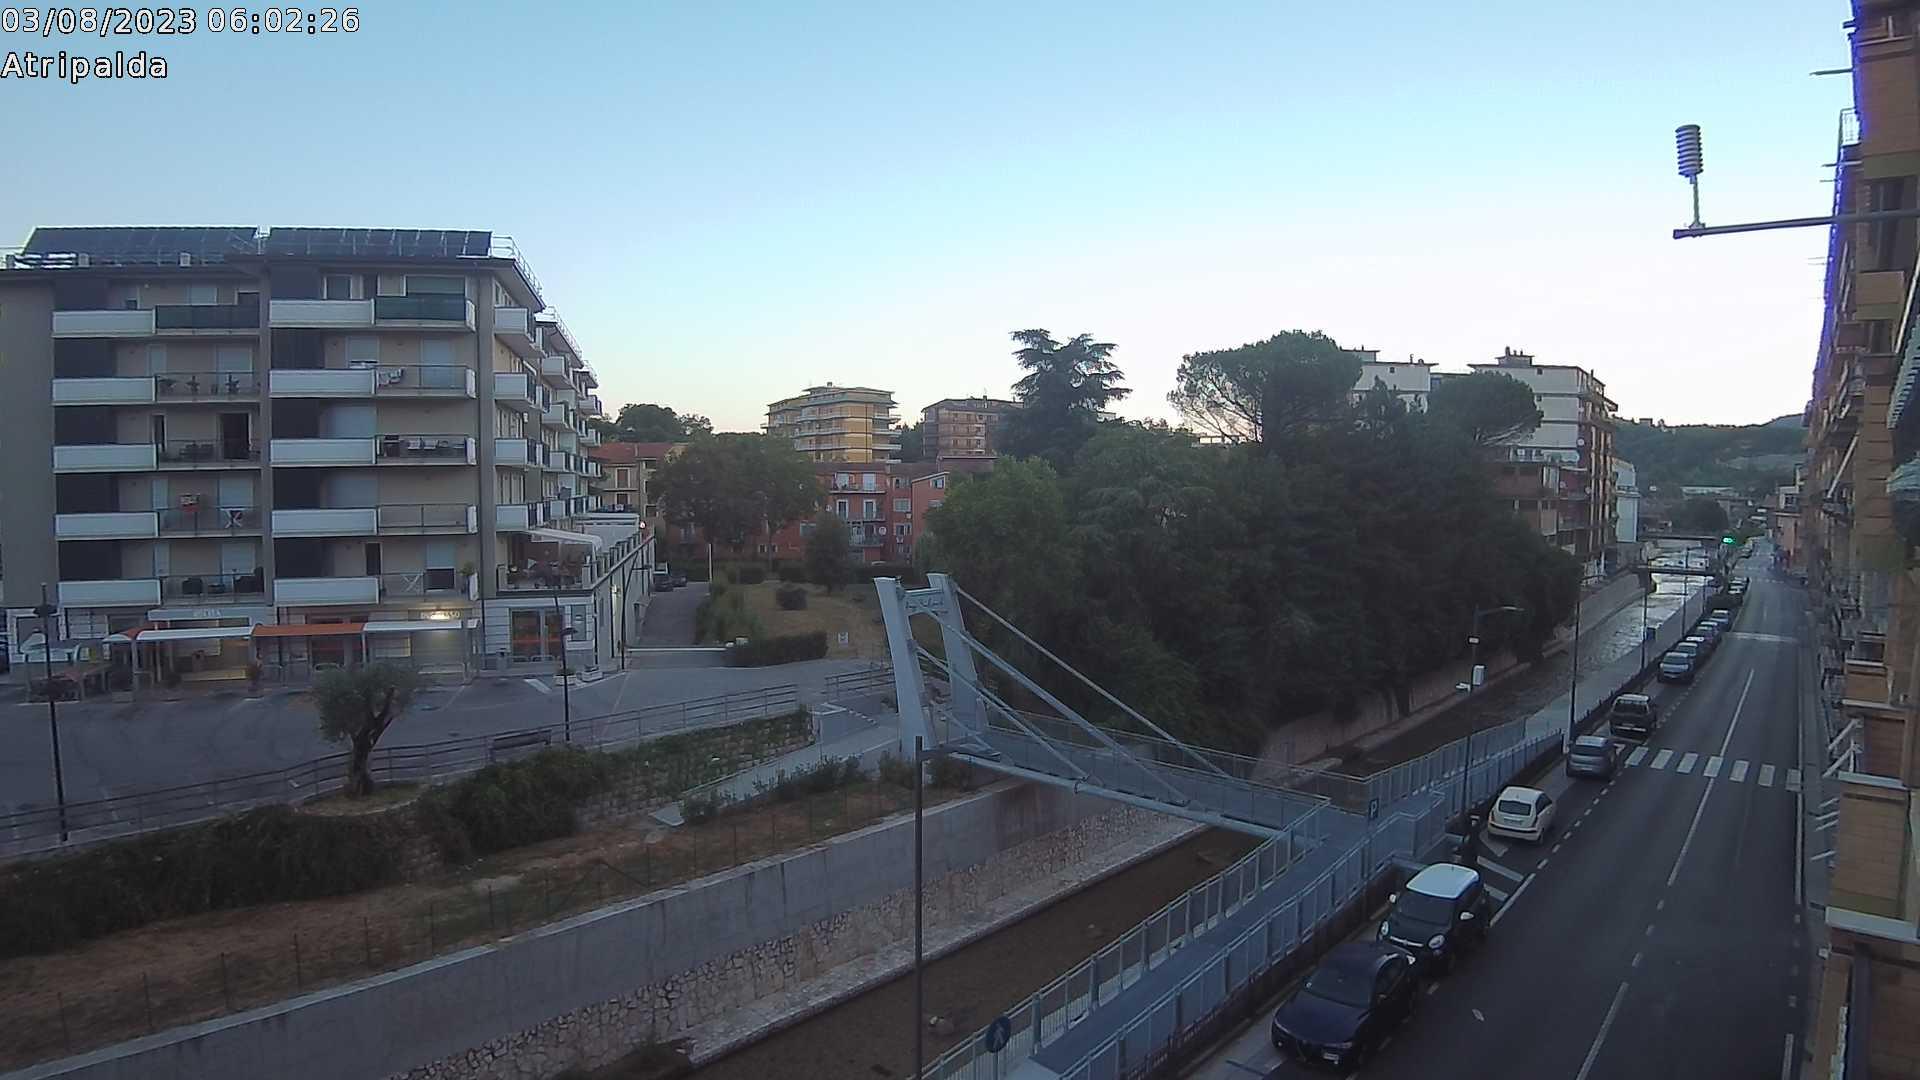 Webcam Atripalda Live AV